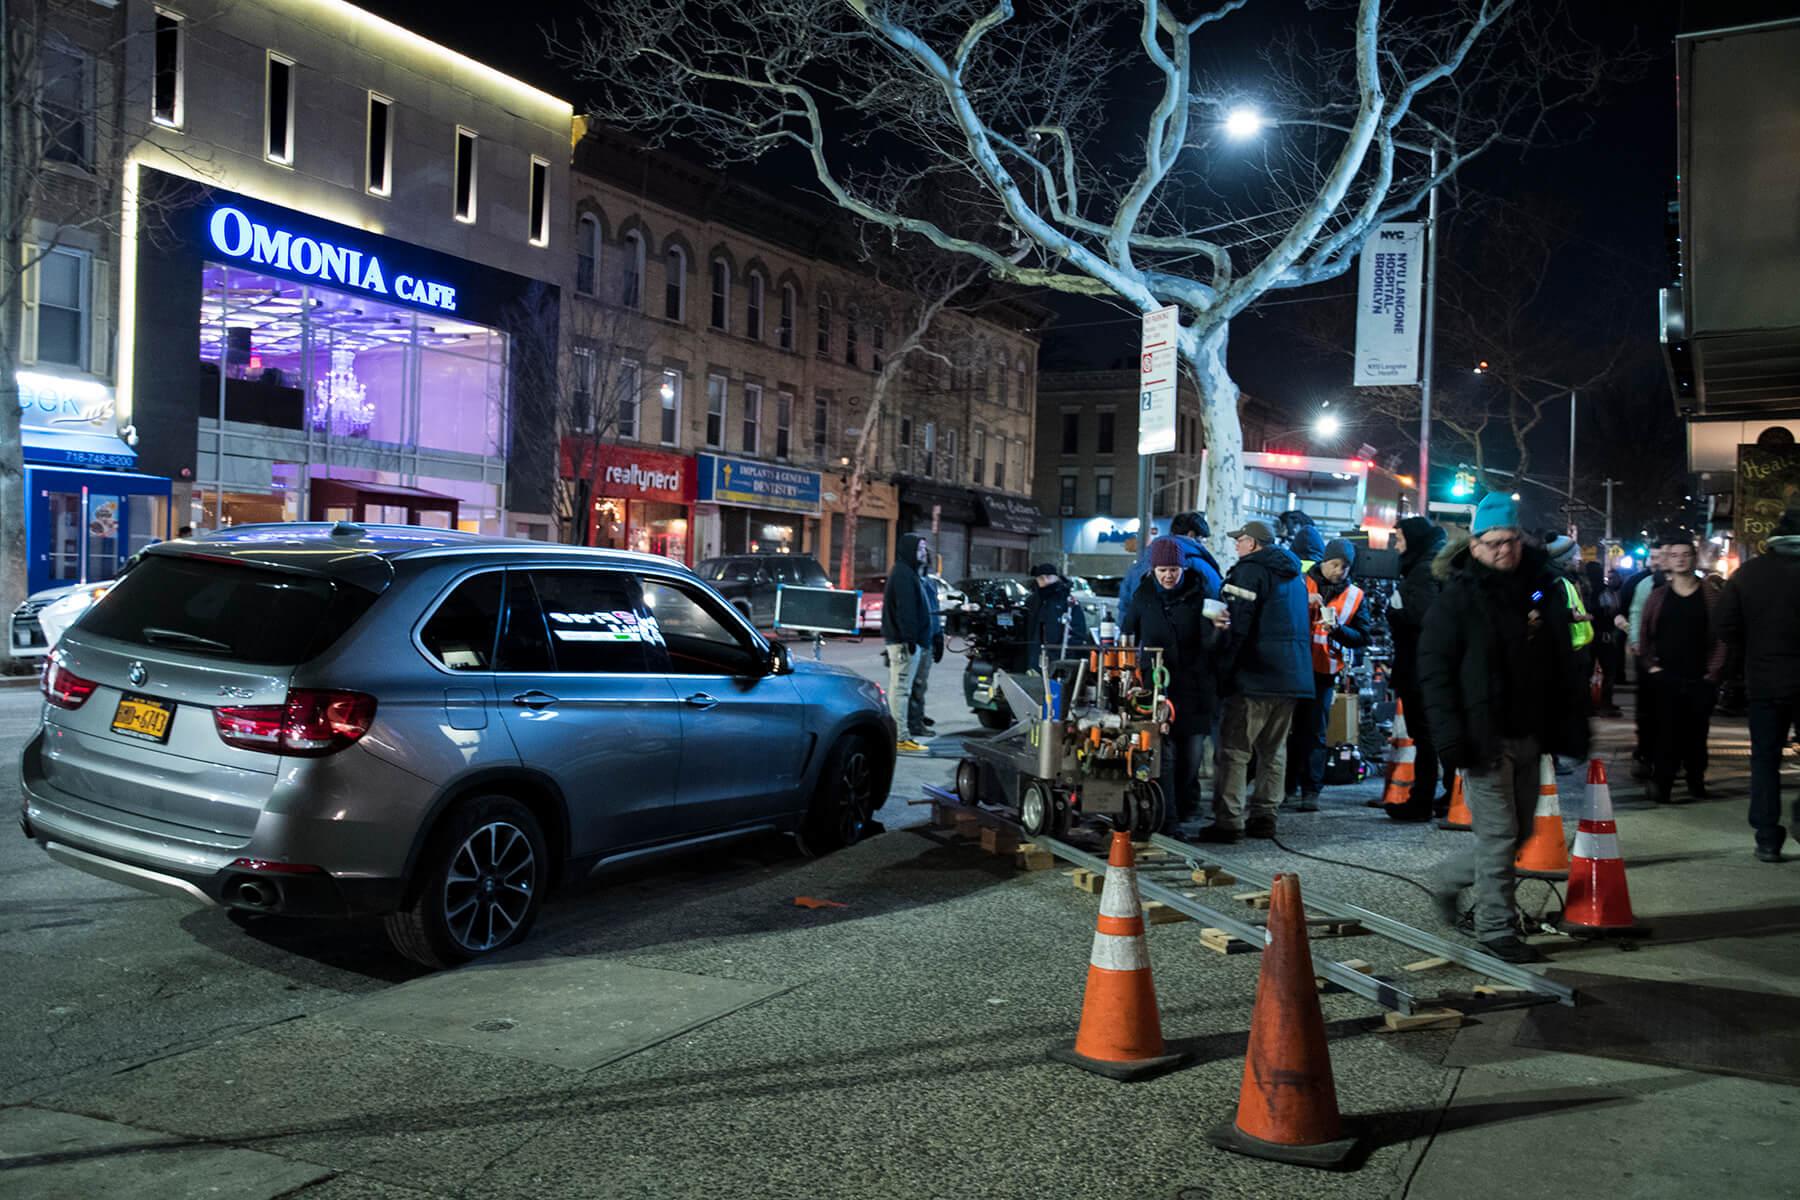 The Good Cop Filming